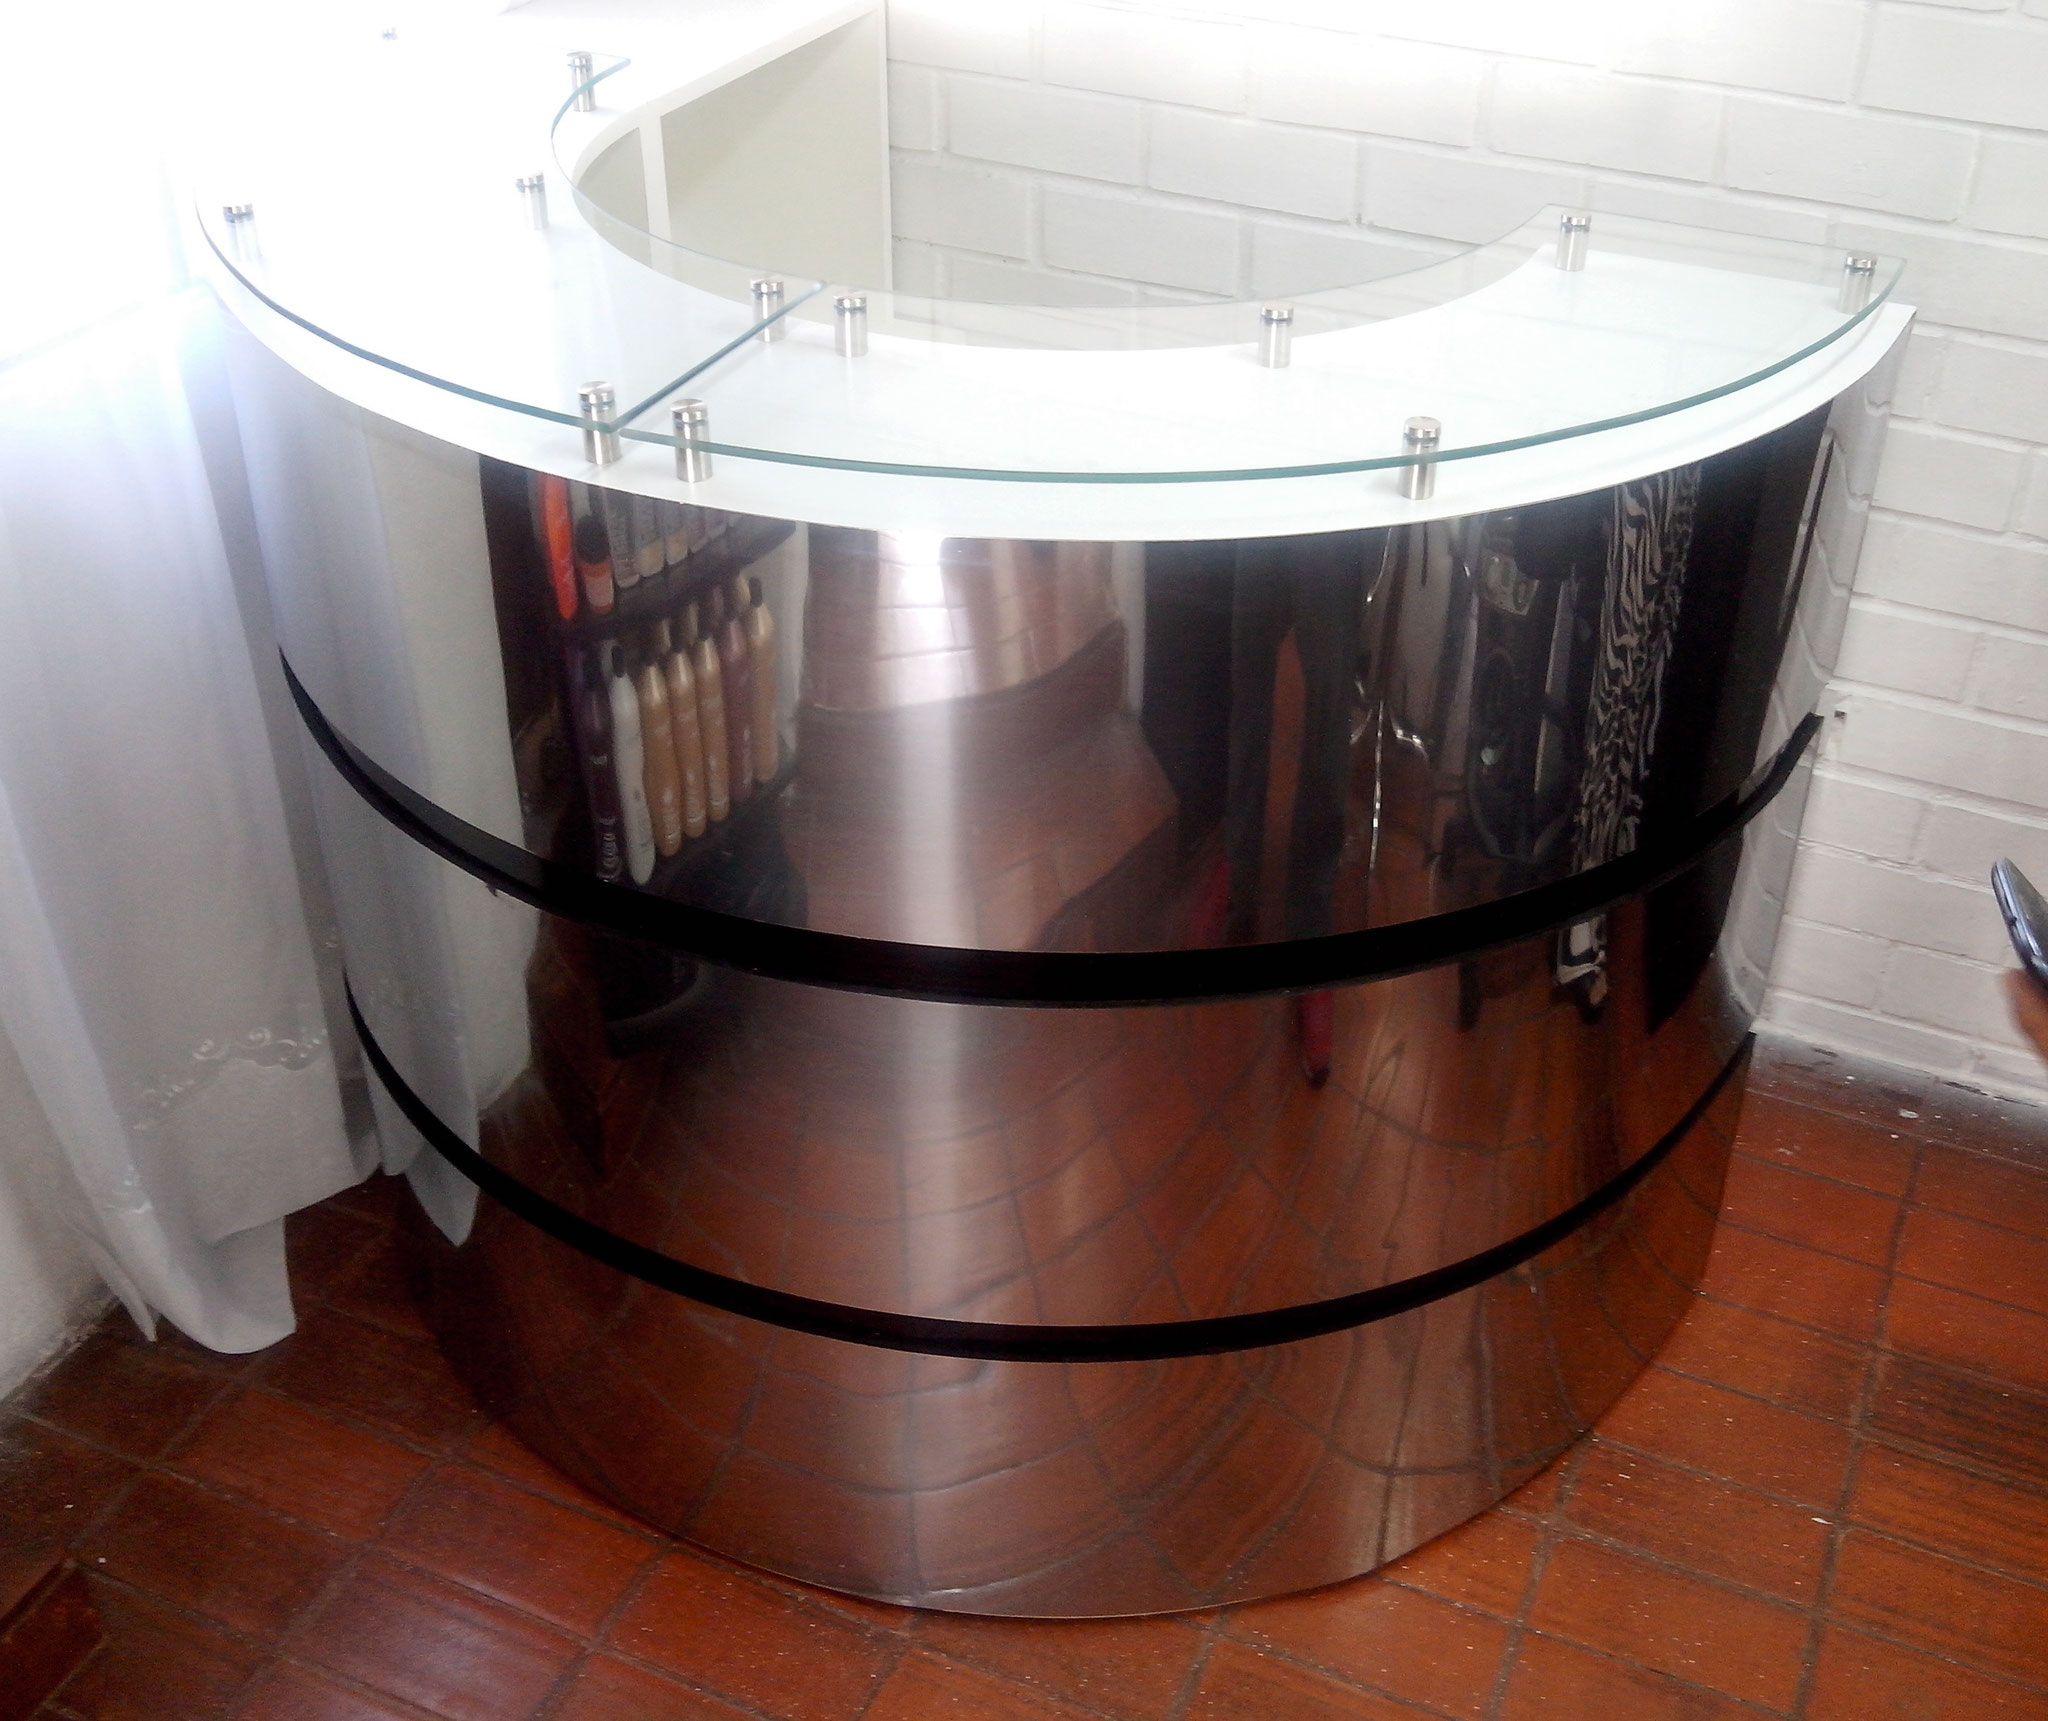 Muebles De Recepci N Muebles De Recepci N Moderna Mueble De  # Muebles Para Kichinet